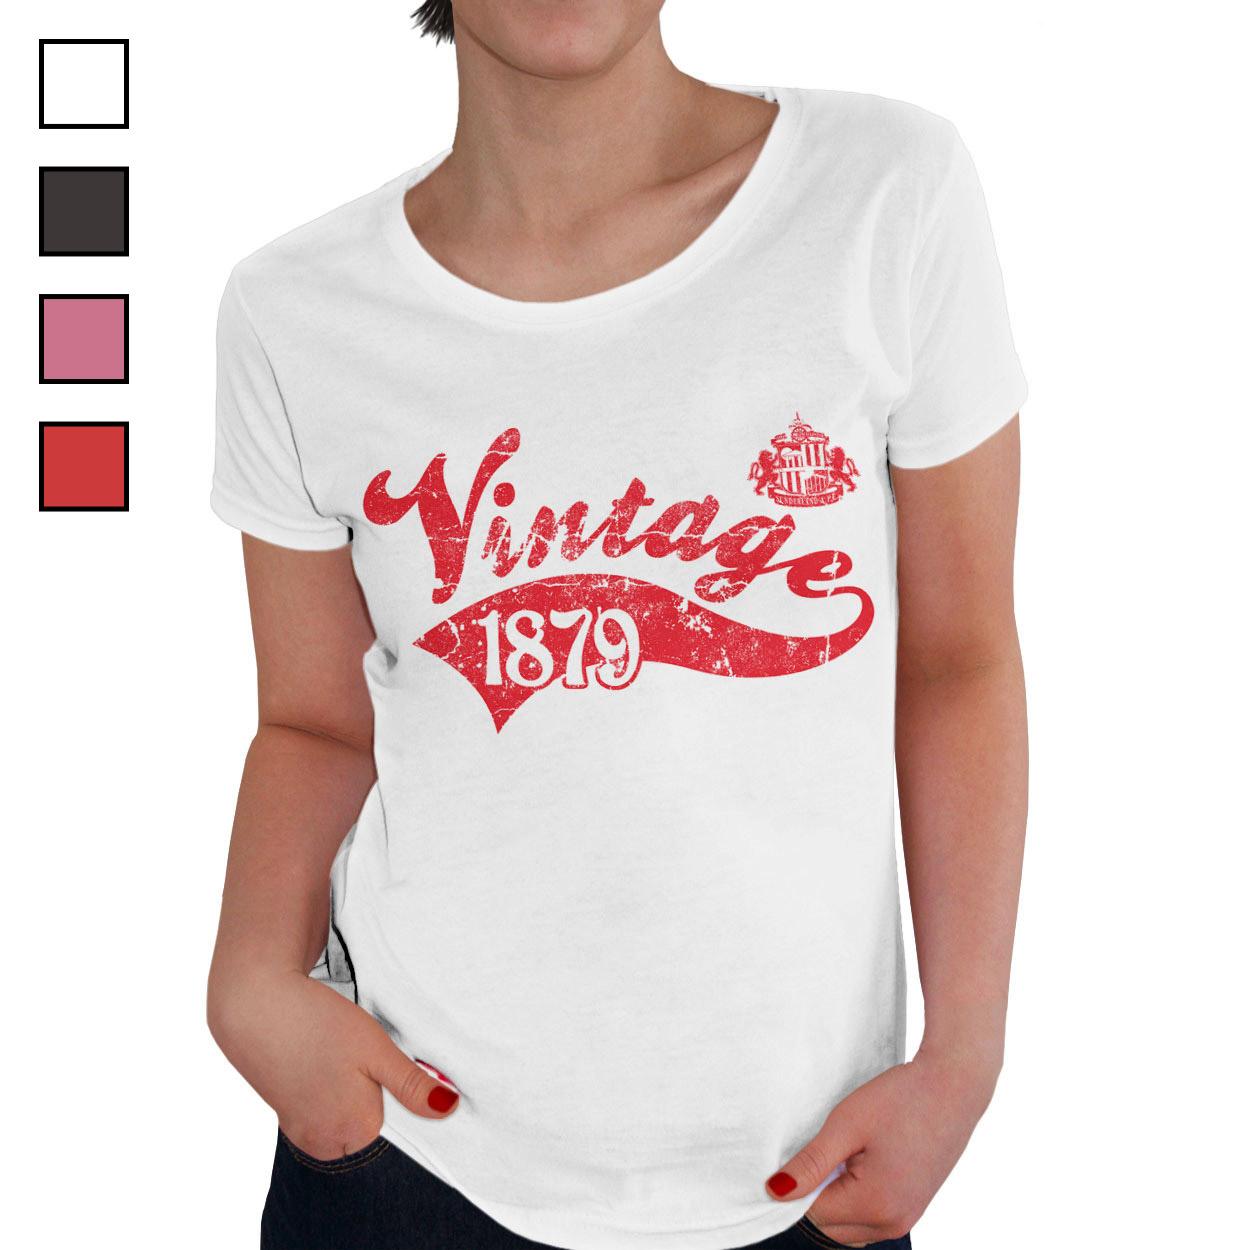 Sunderland AFC Ladies Vintage T-Shirt